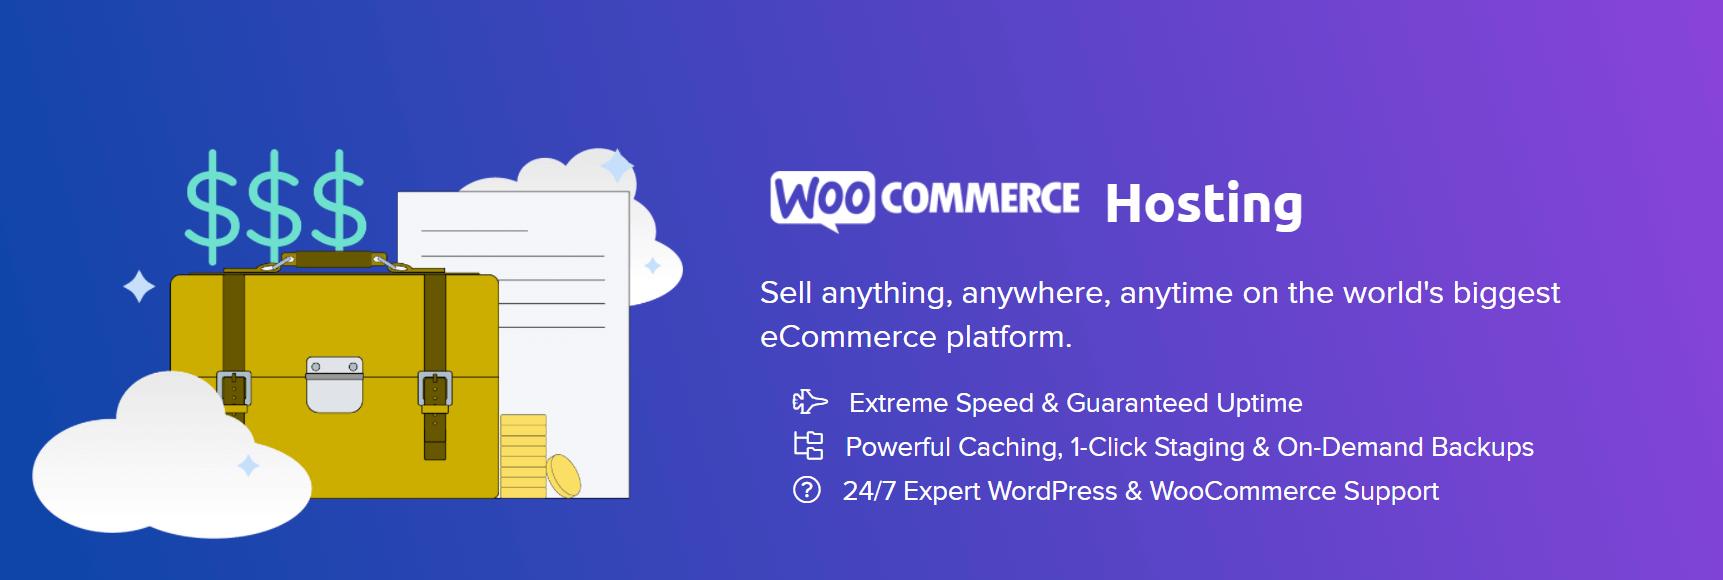 Dreamhost-woocommerce-hosting